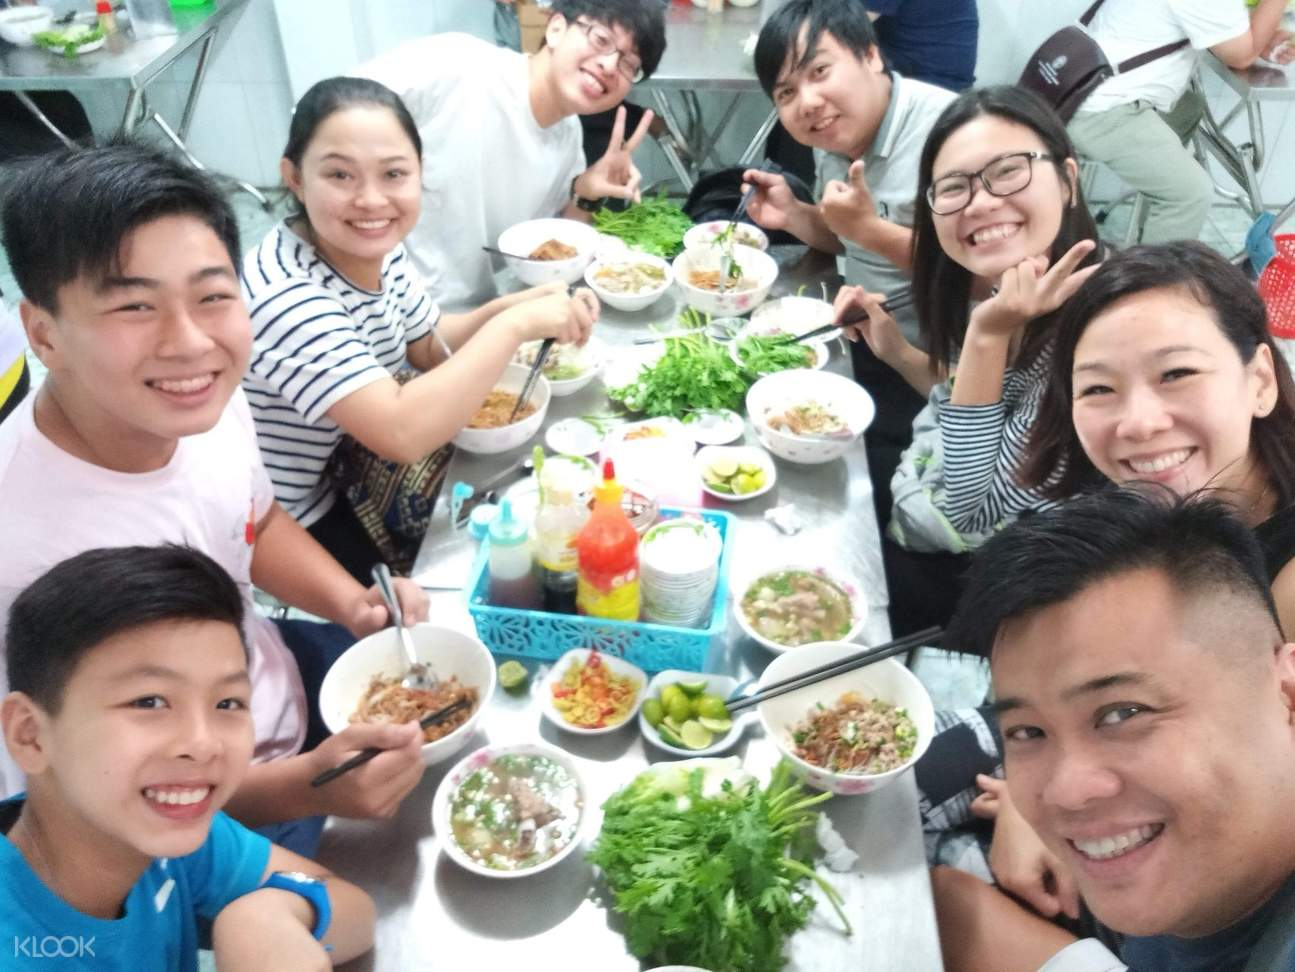 people enjoying their meal in saigon